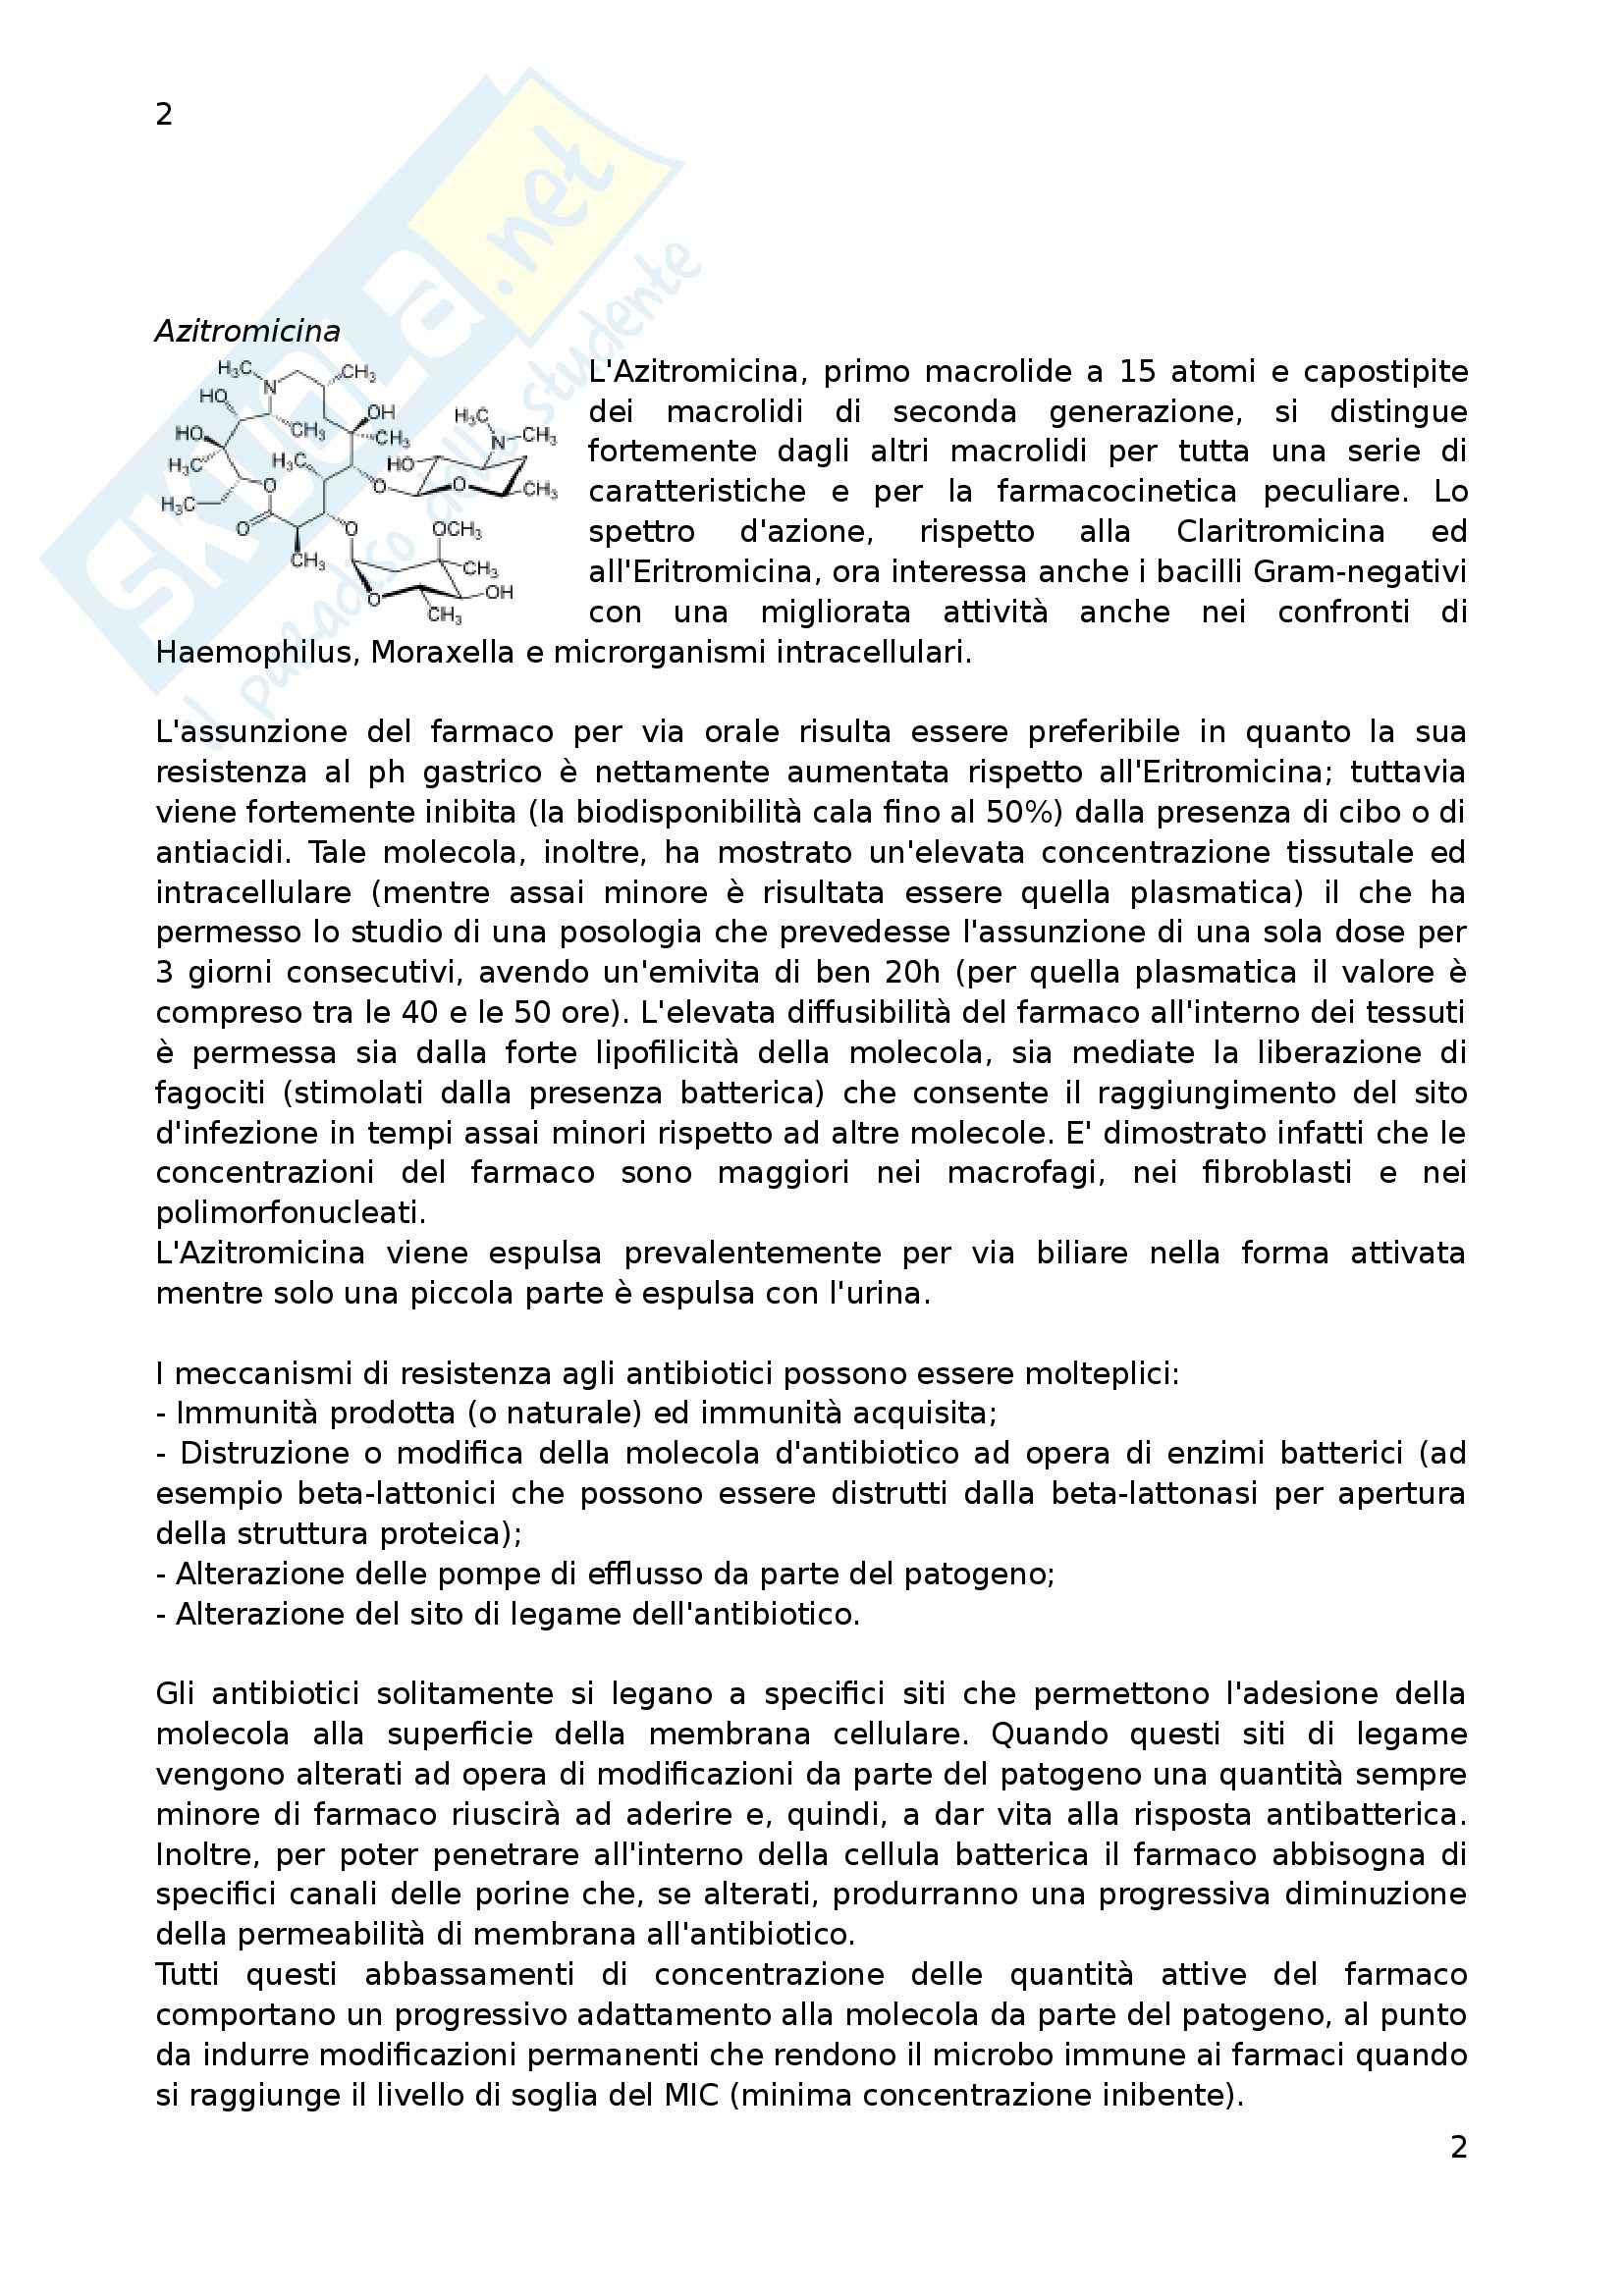 Chimica biofarmaceutica - Appunti Pag. 2